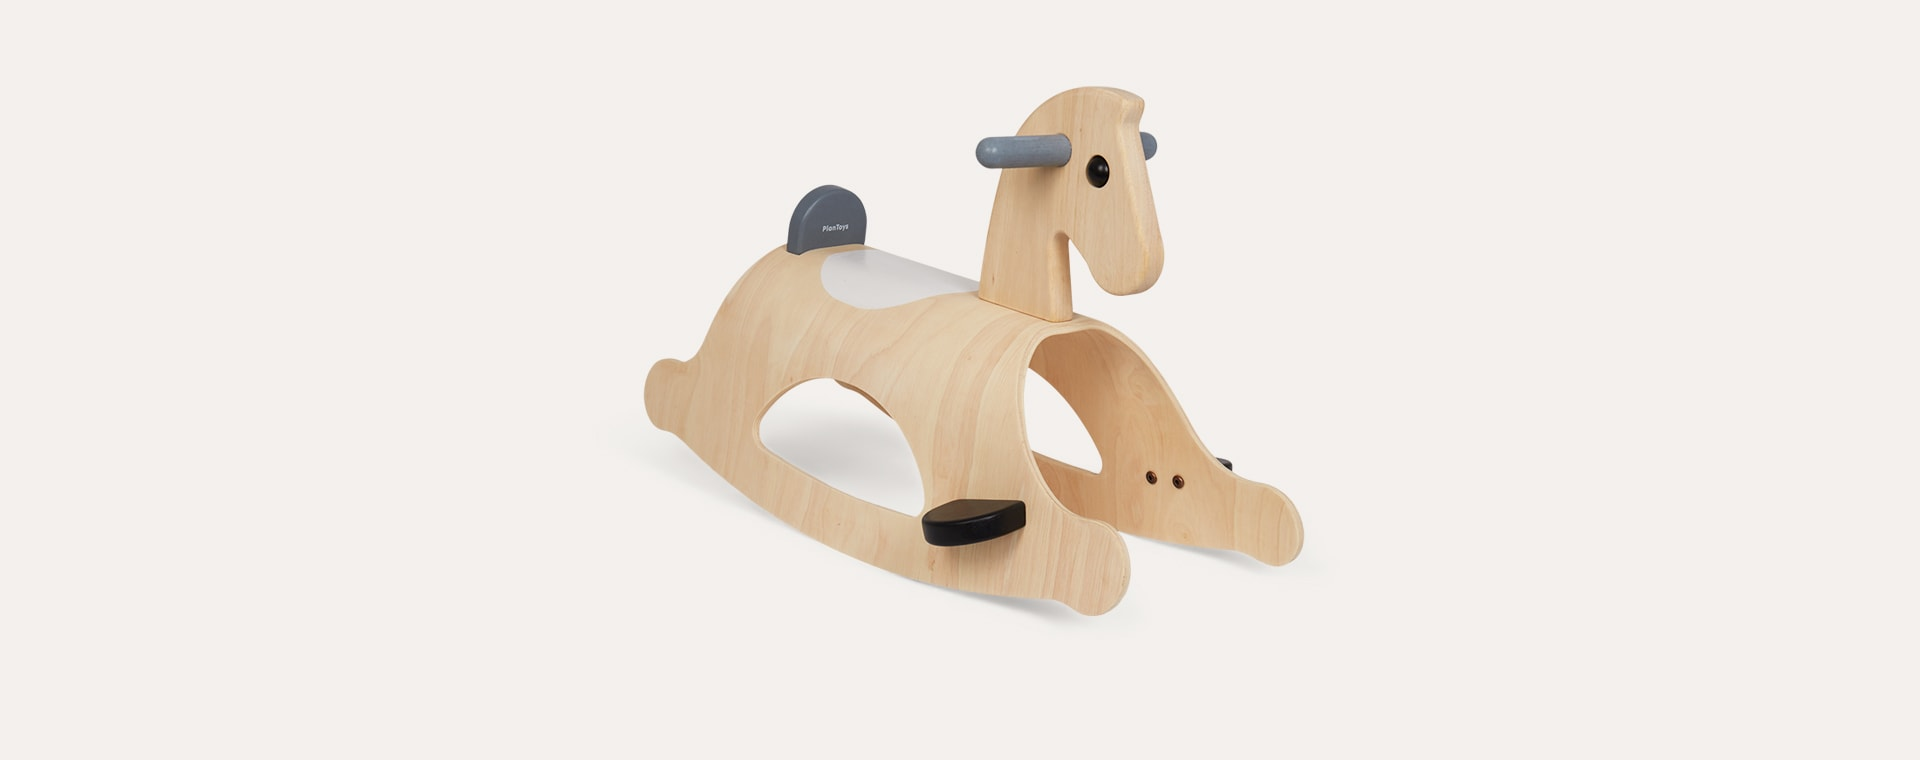 Monochrome Plan Toys Palomino Rocking Horse